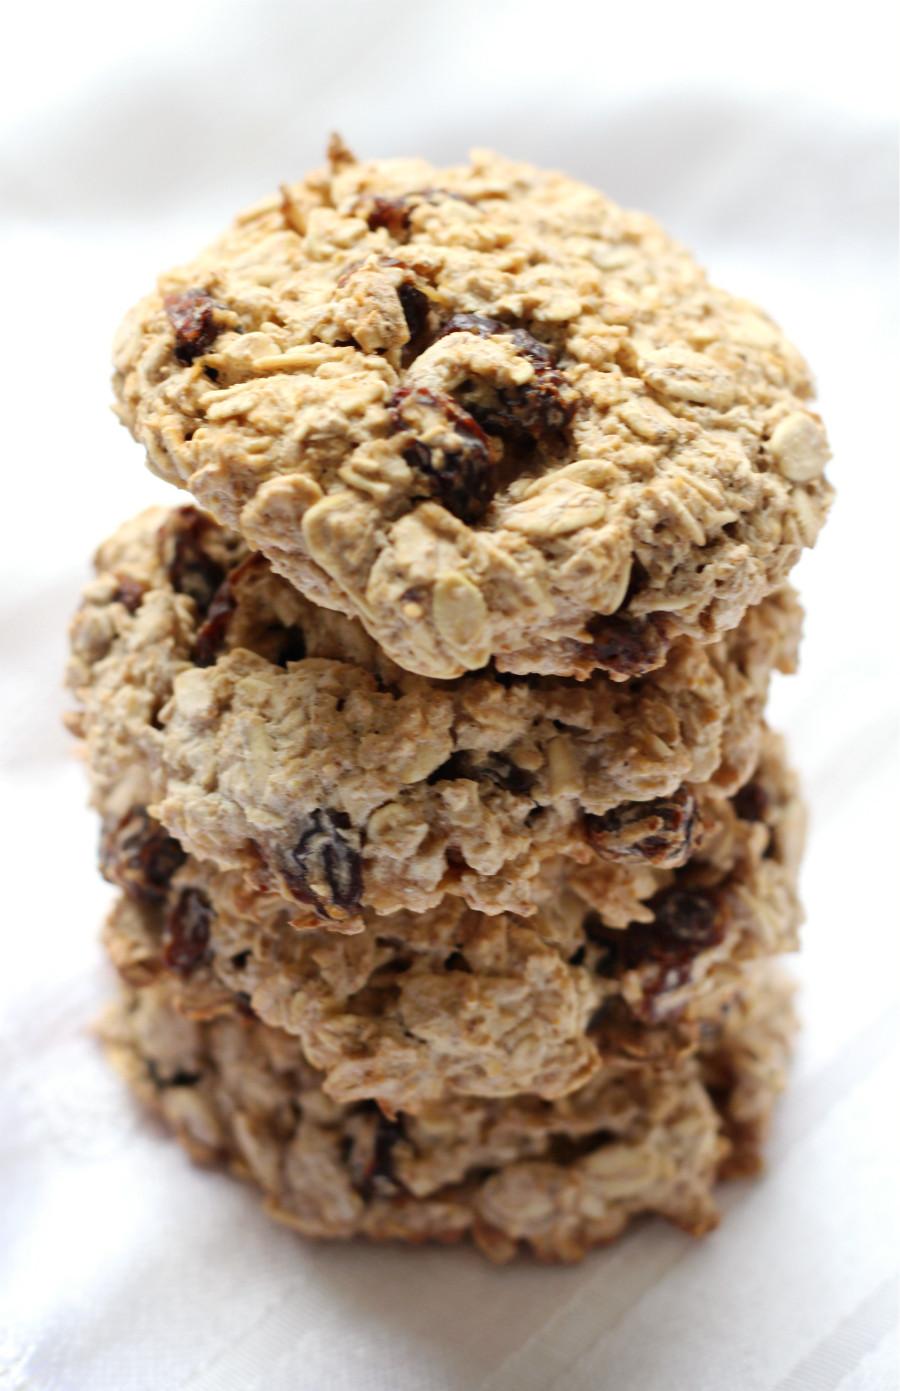 Healthy Vegan Oatmeal Raisin Cookies  Chewy Gluten Free Oatmeal Raisin Cookies Allergy Free Vegan